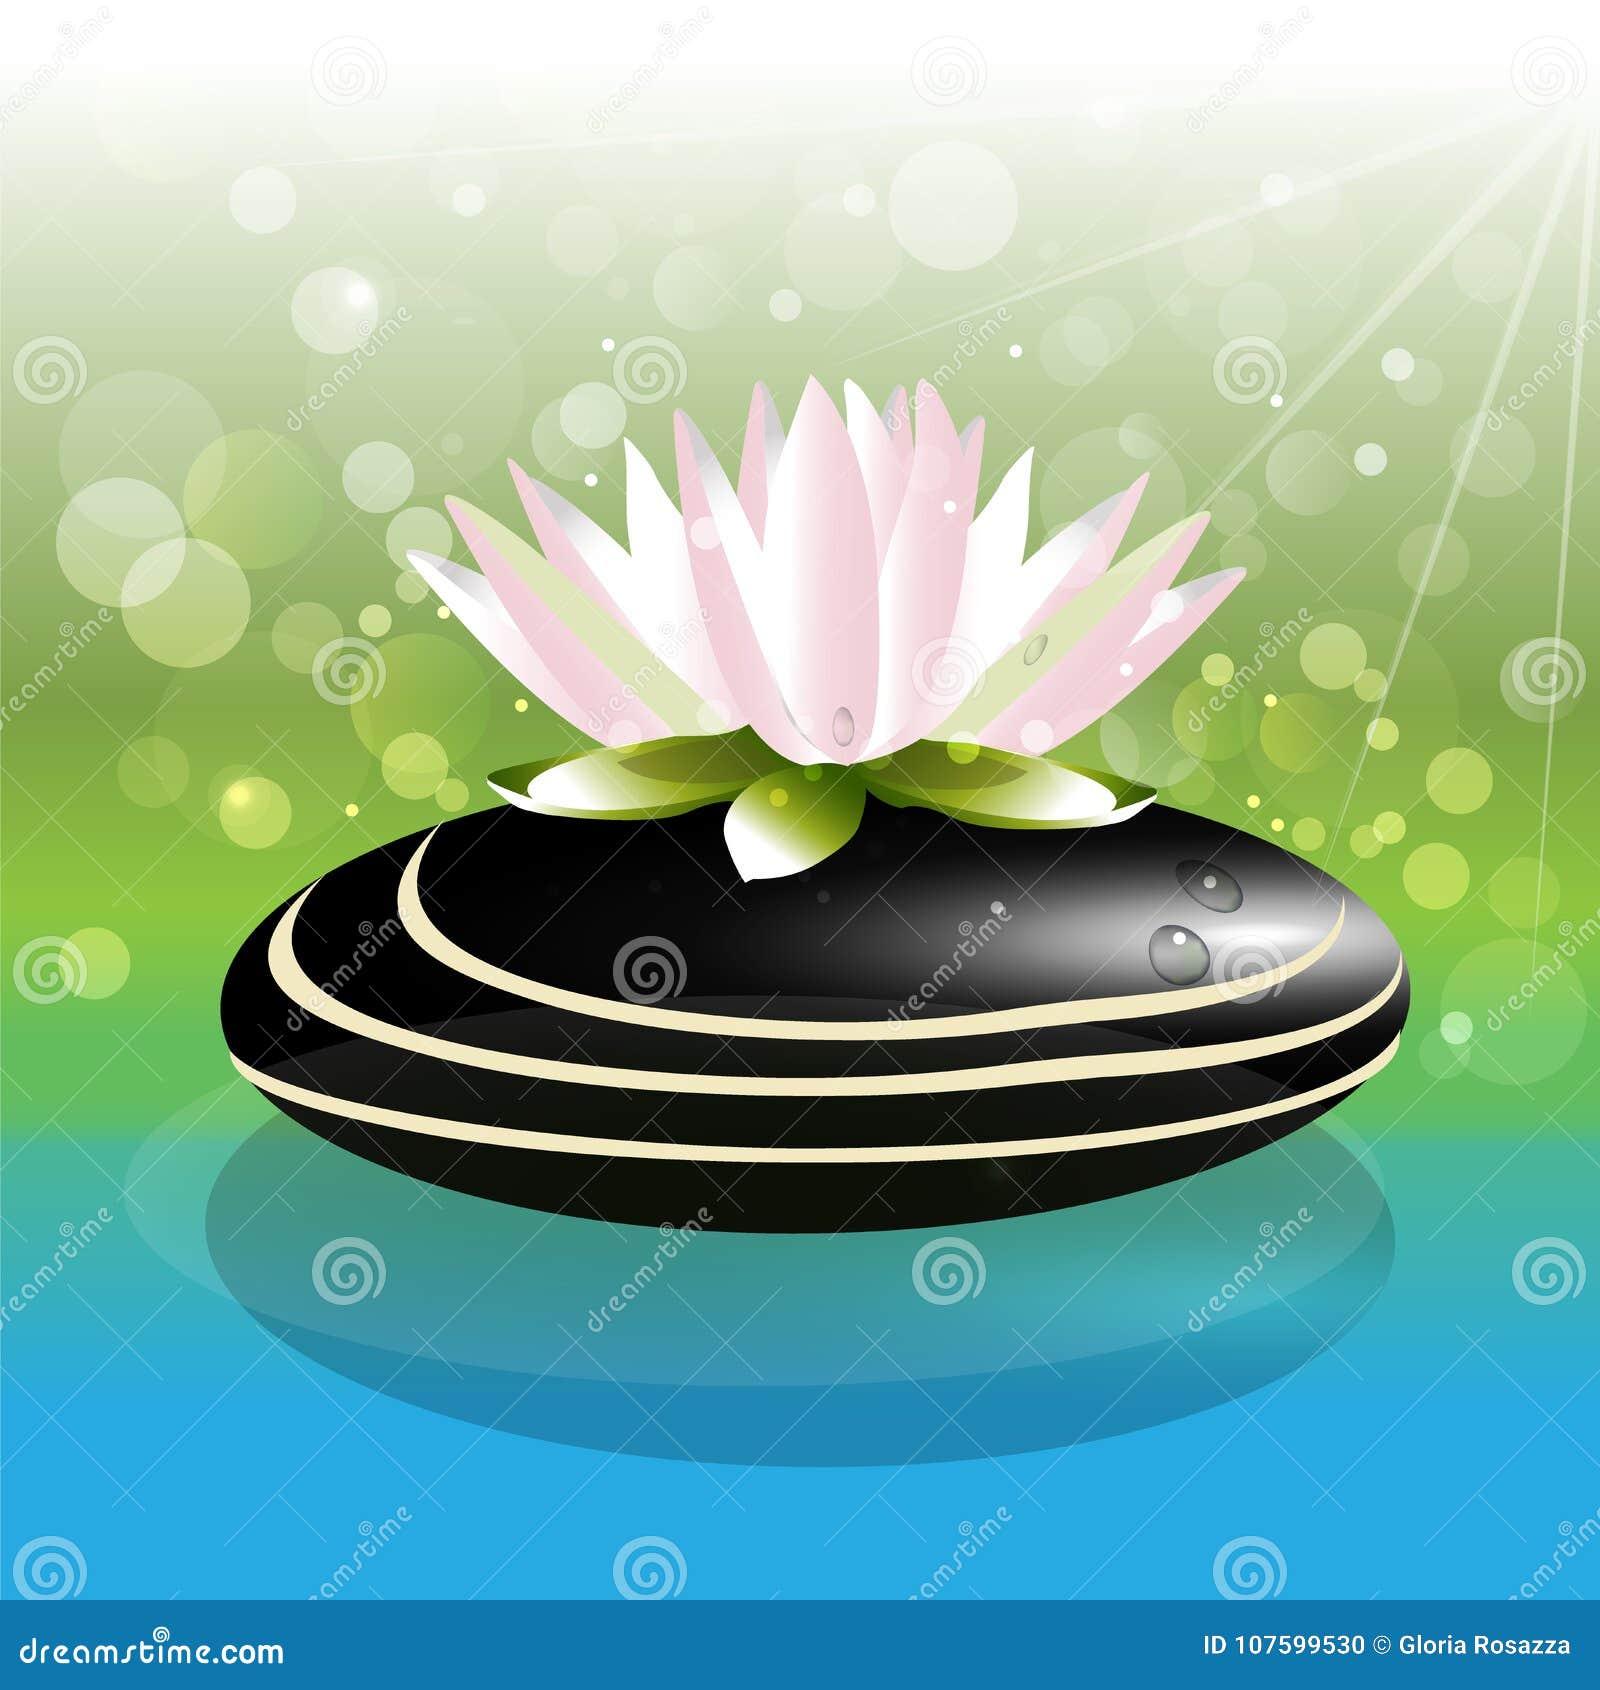 Lotus flower sparkle bubbles on black spa stone logo stock vector lotus flower sparkle bubbles on black spa stone logo graphics backdrop izmirmasajfo Gallery